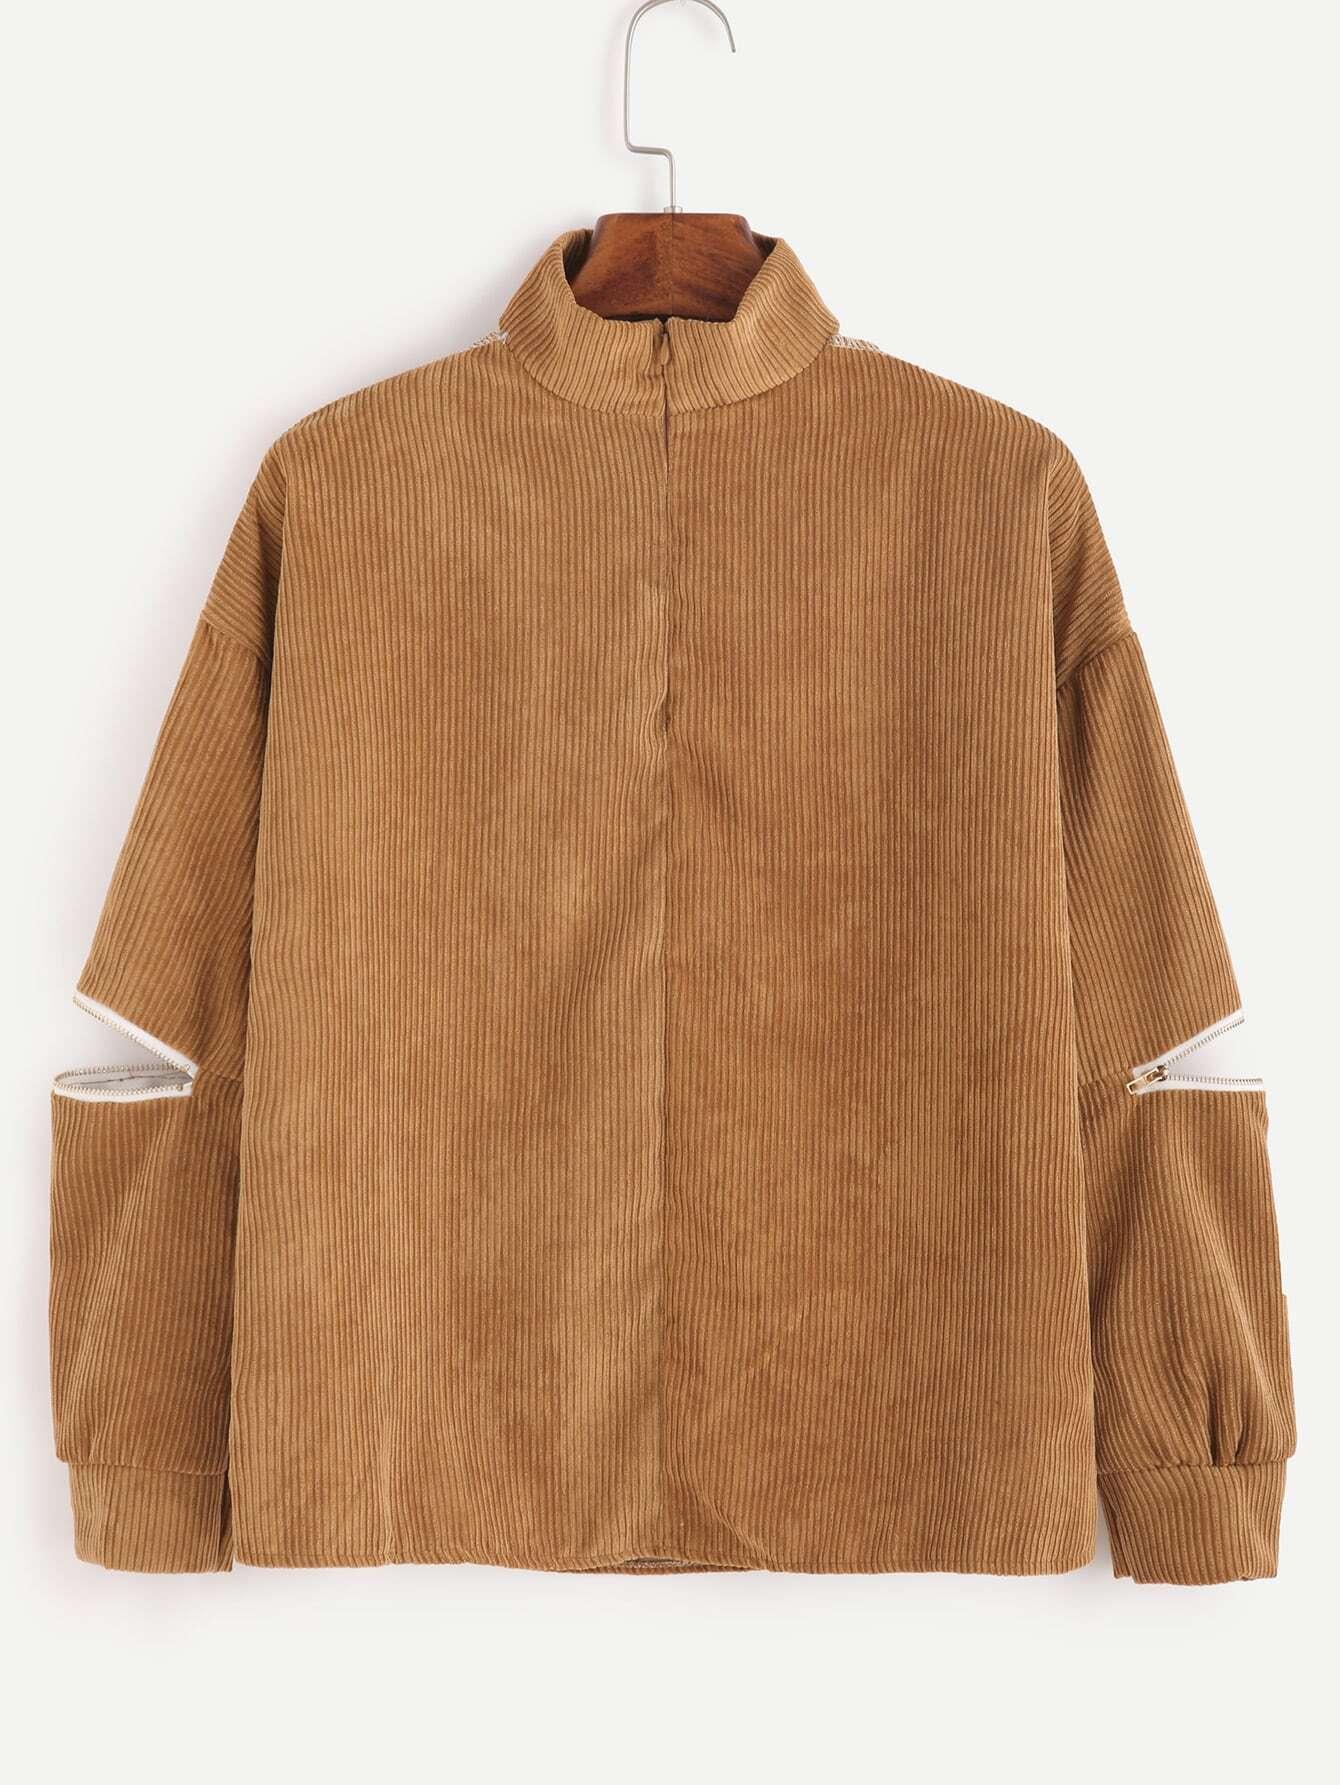 Khaki V Cut Corduroy Zippers Blouse